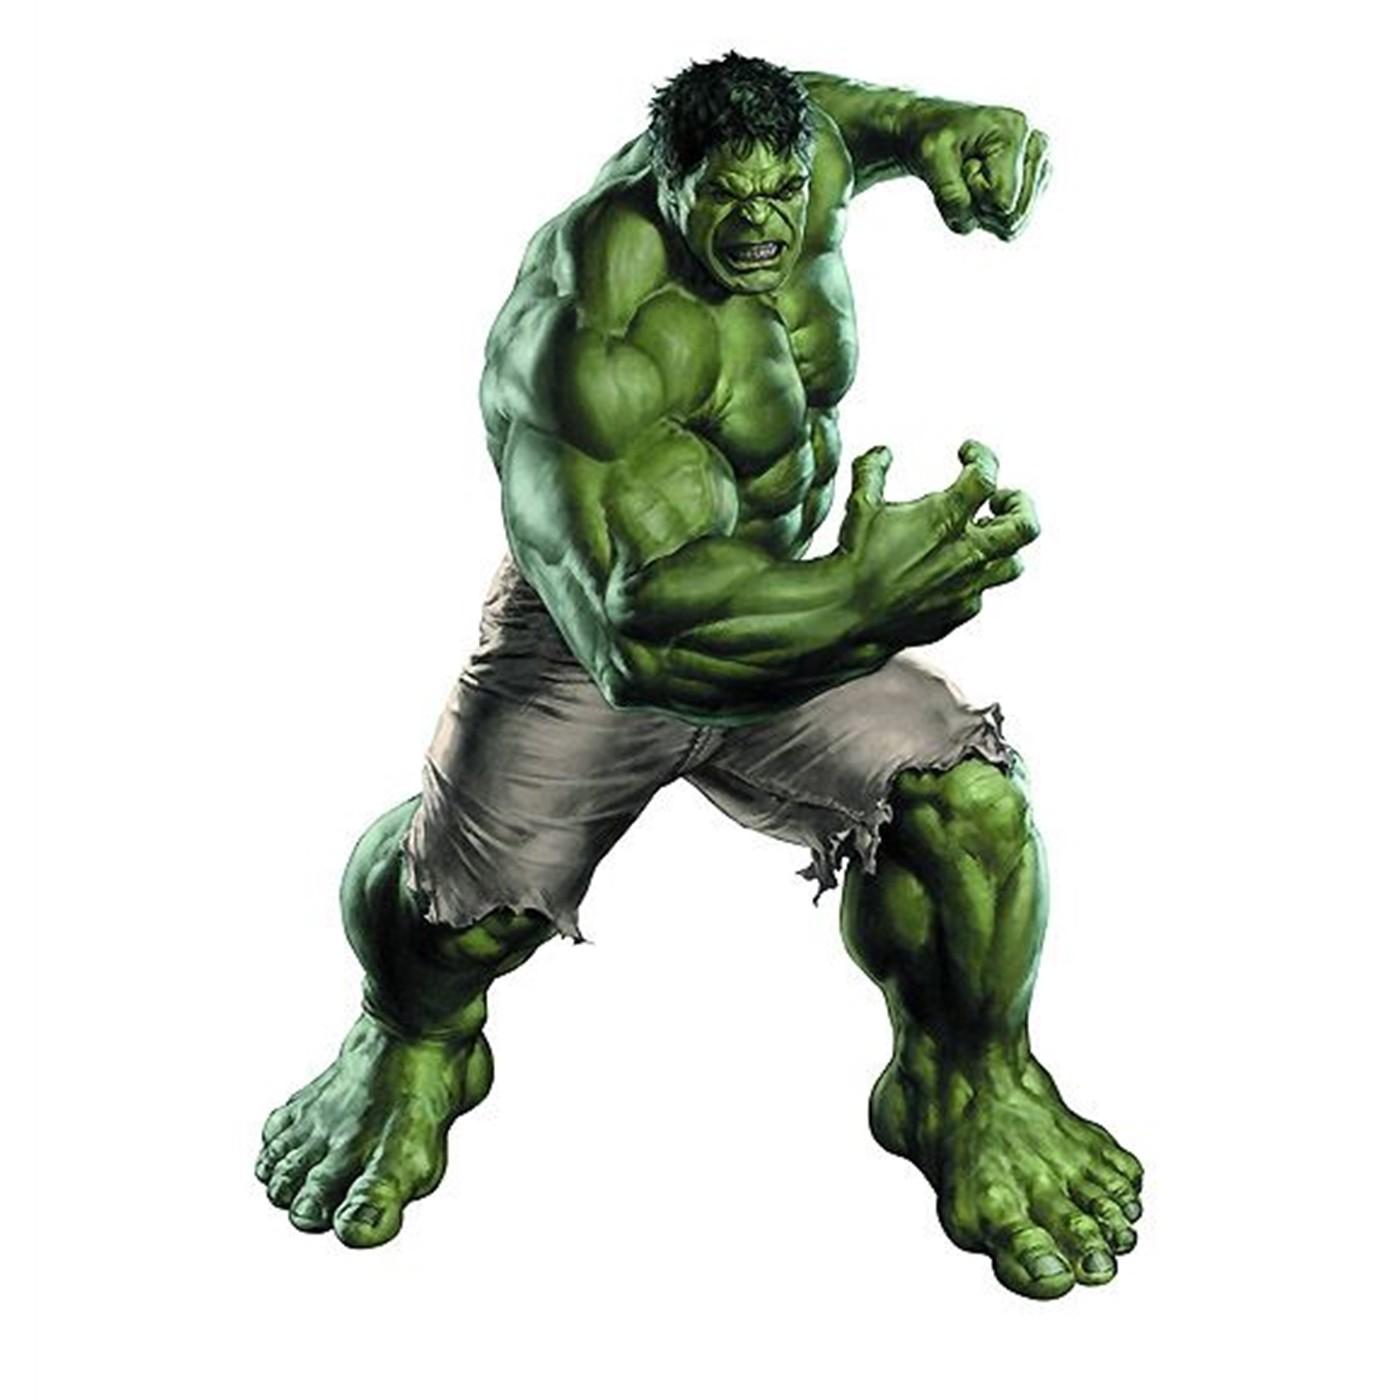 The Avengers Movie Incredible Hulk Cardboard Standup